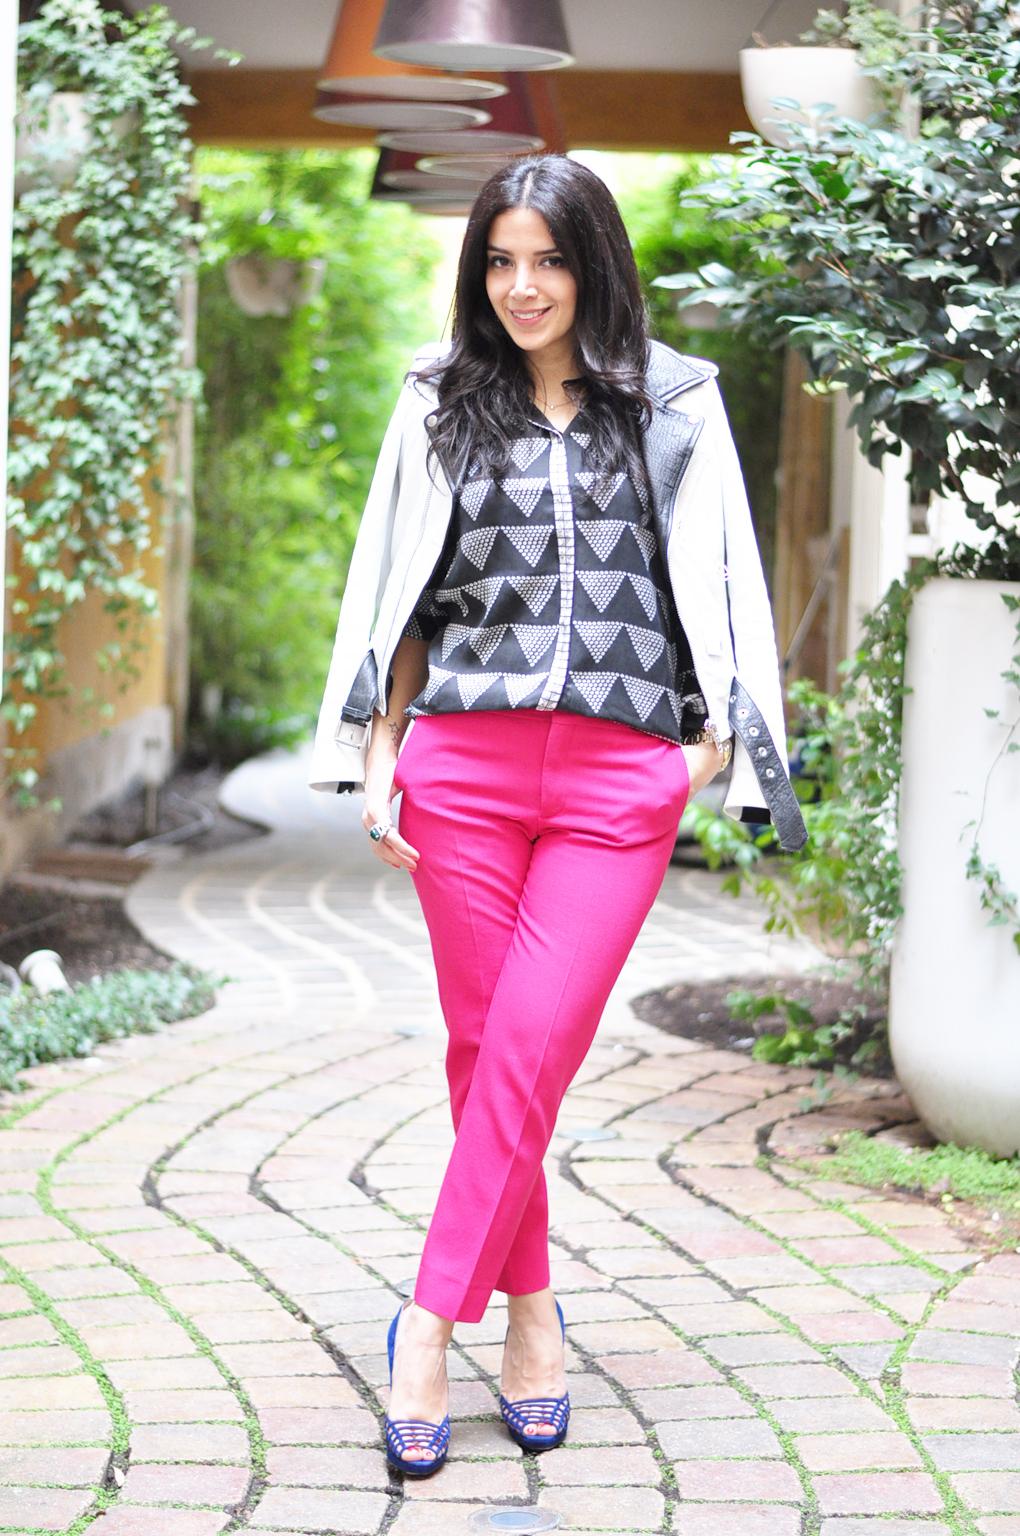 Lyla_Loves_Fashion_equipment_shirt_1